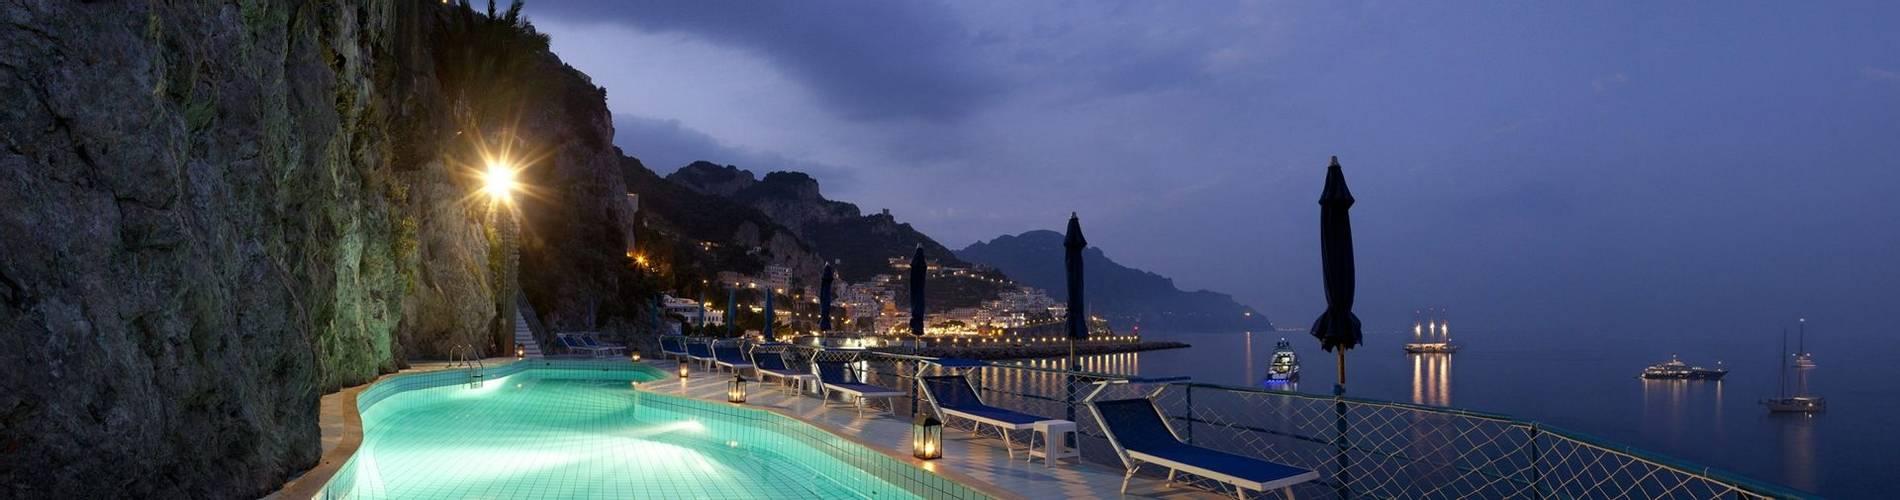 Miramalfi, Amalfi Coast, Italy (38).jpg